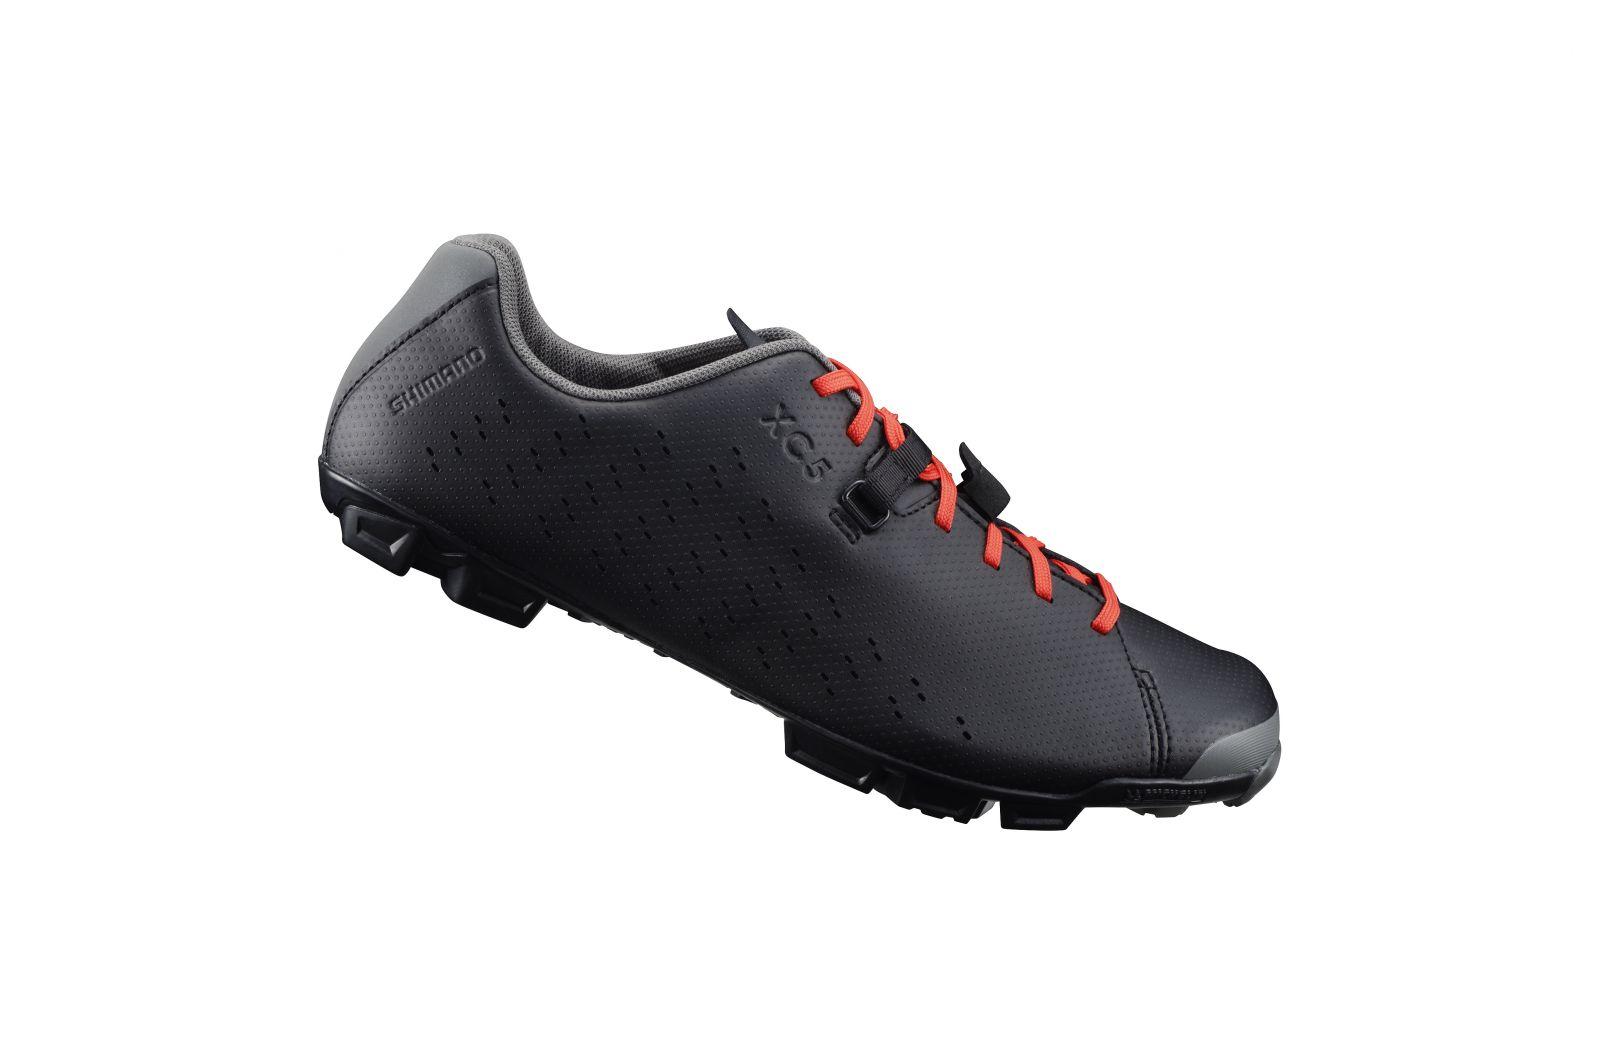 SHIMANO MTB obuv SH-XC500ML, černá, 48